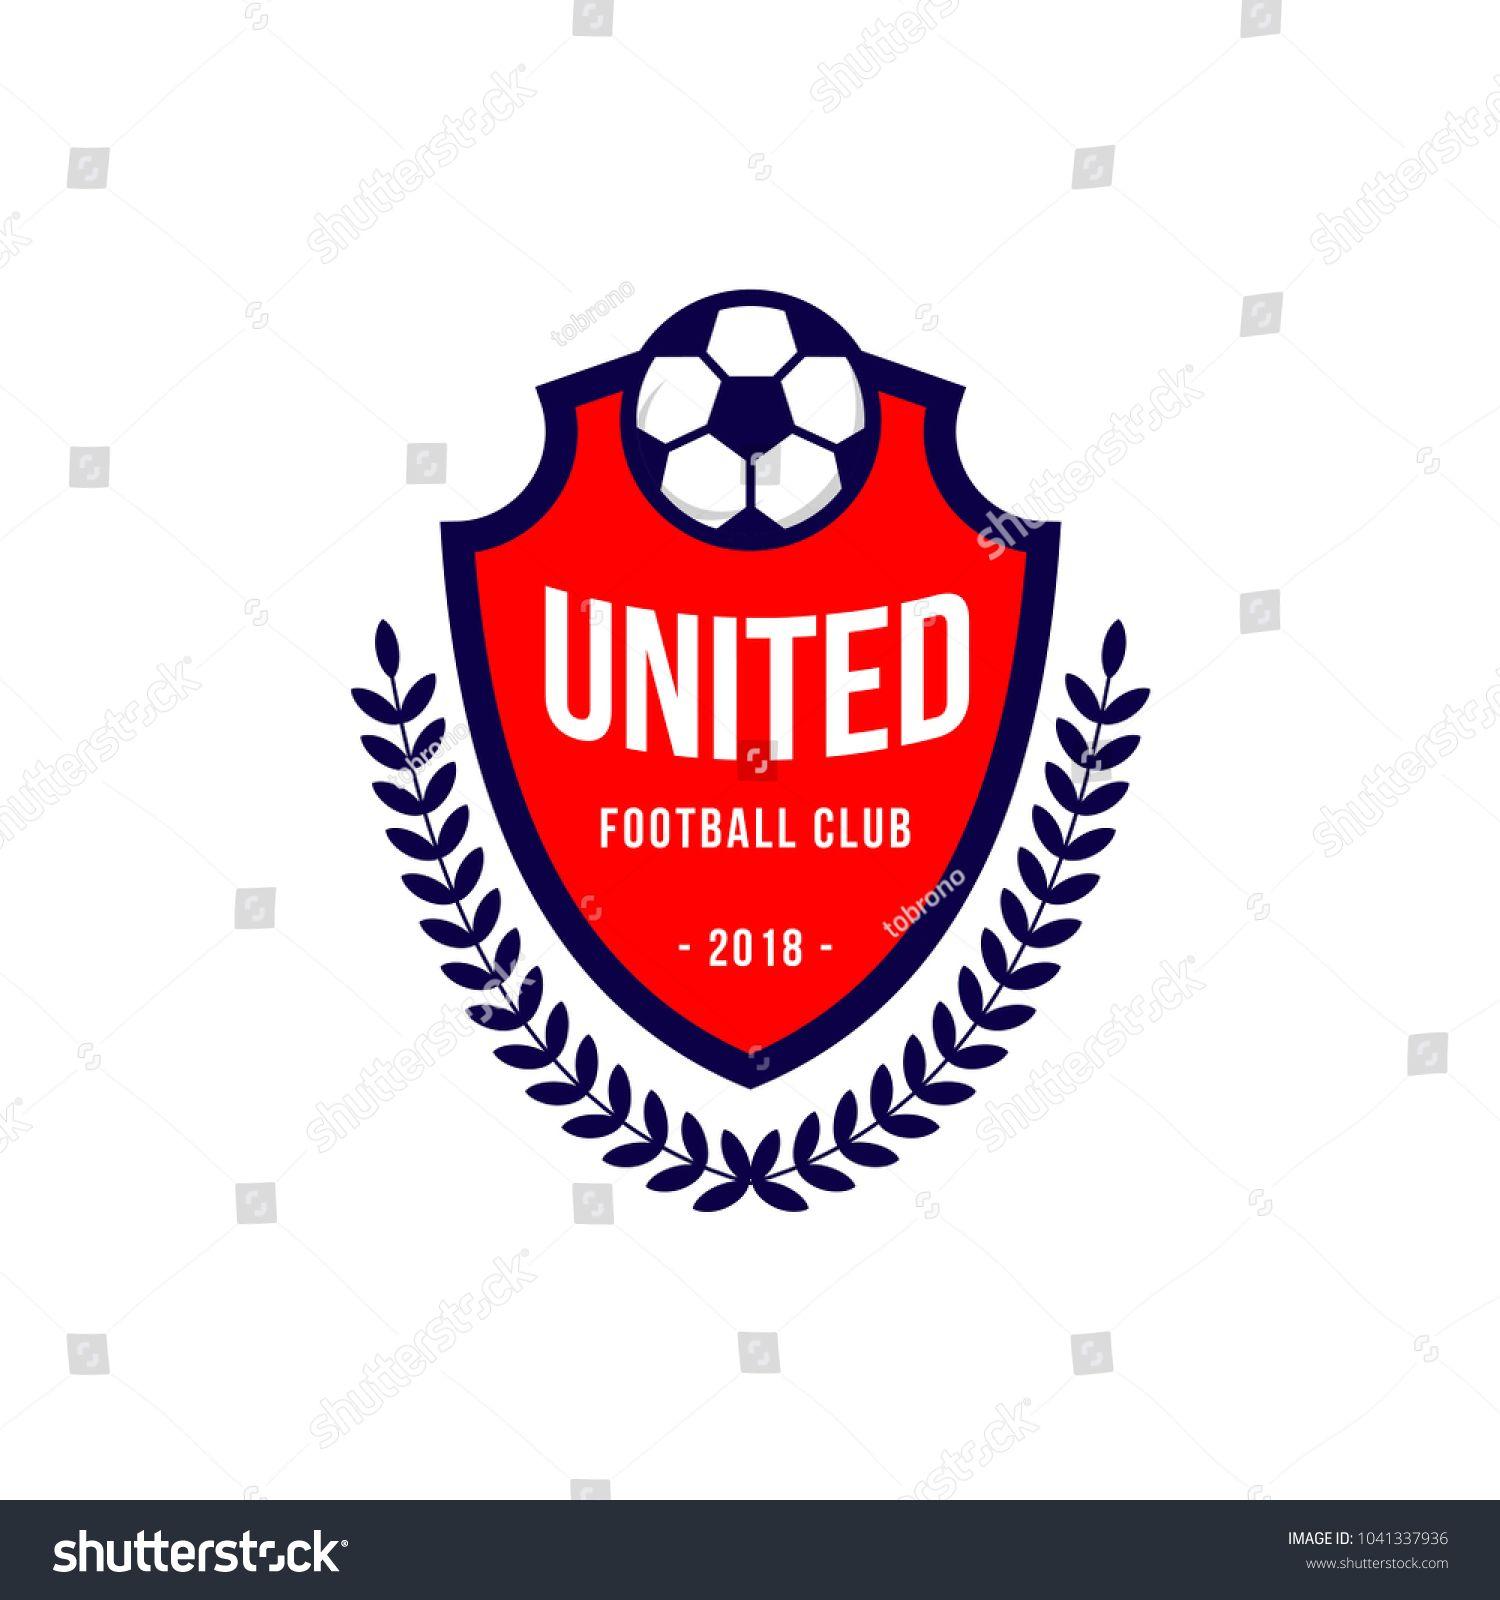 United Football Club Logo Vector Template Design Ad Sponsored